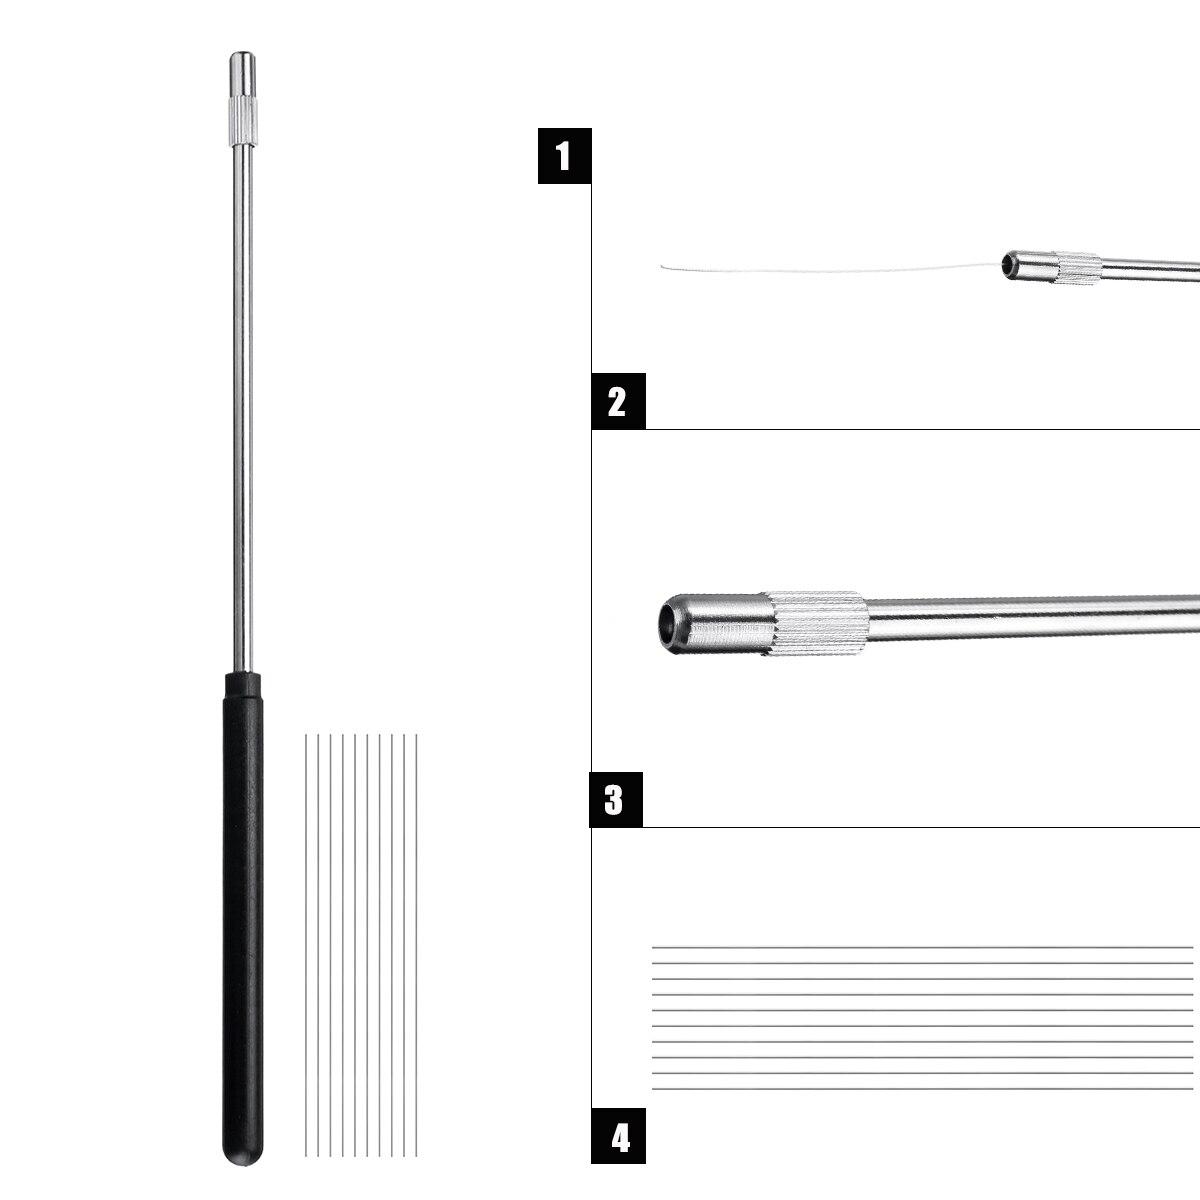 220mm Inoculating Rod+10 Inoculating Ring 70mm Microbiology Inoculation Inoculating Rod Handle Loop With 10 Nichrome Wire Needle